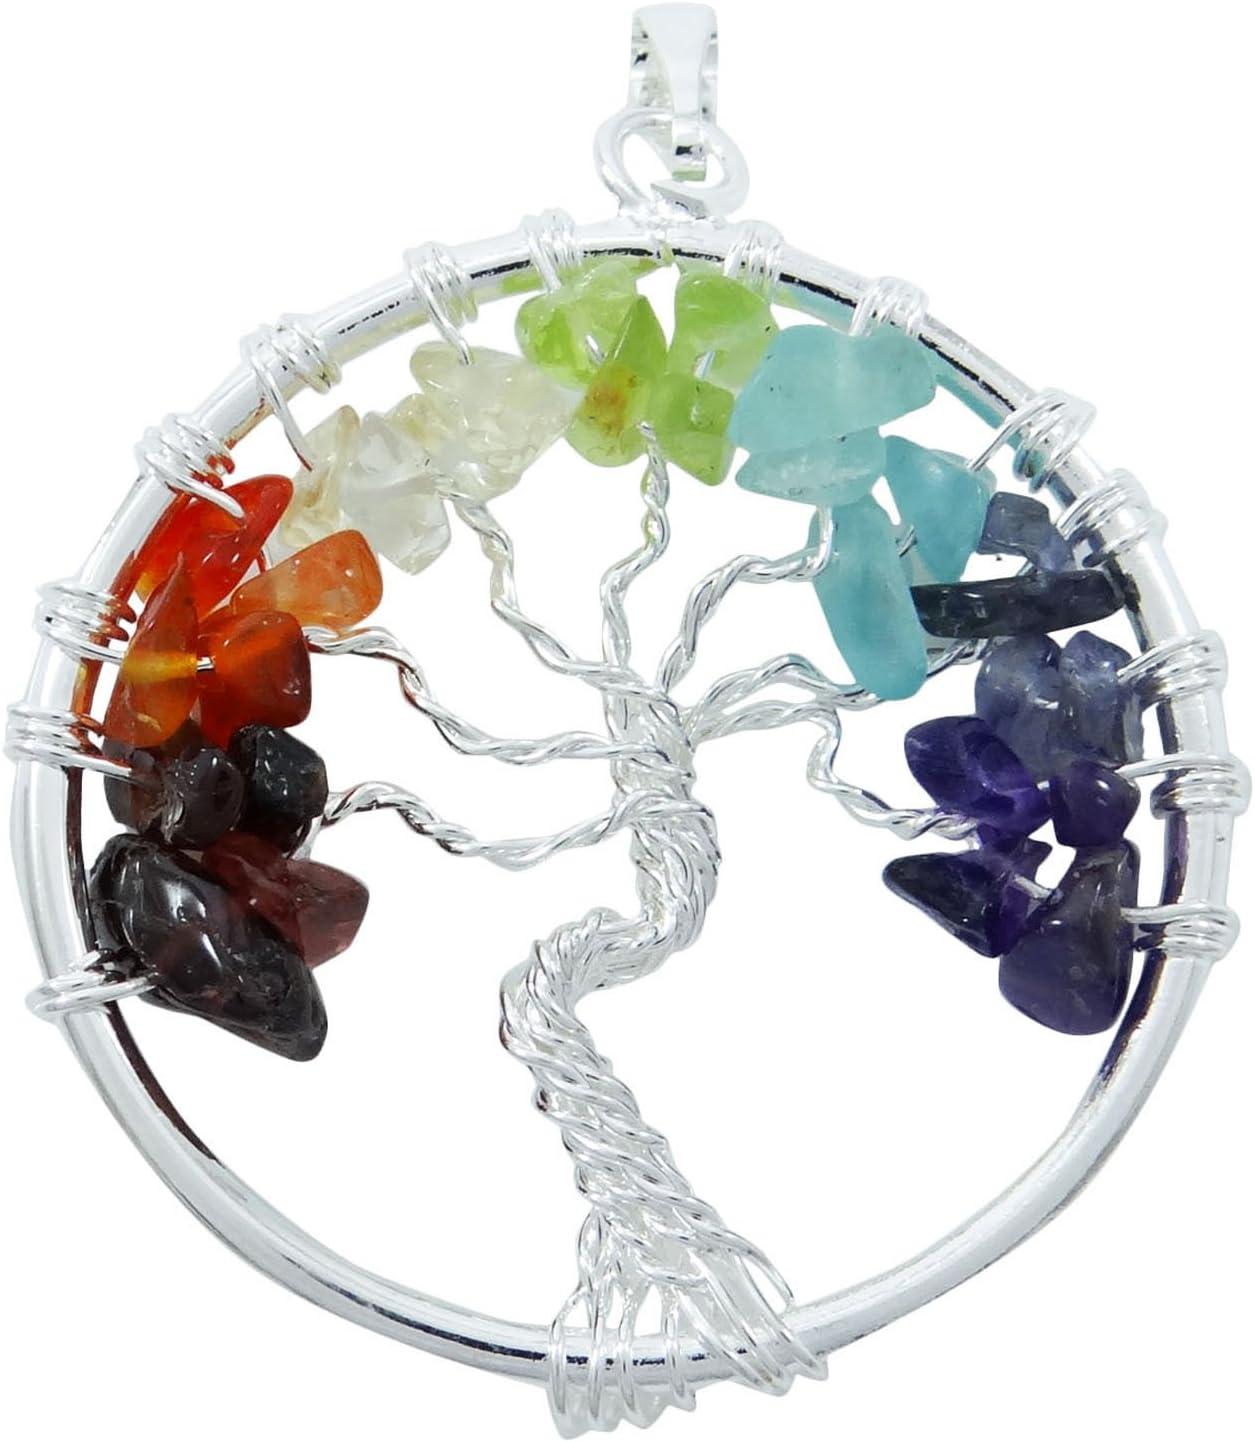 Harmonize Árbol de la Cura de Cristal de Vida de los Chakras Colgante Semipreciosa Chips Reiki Piedras Preciosas Don Espiritual